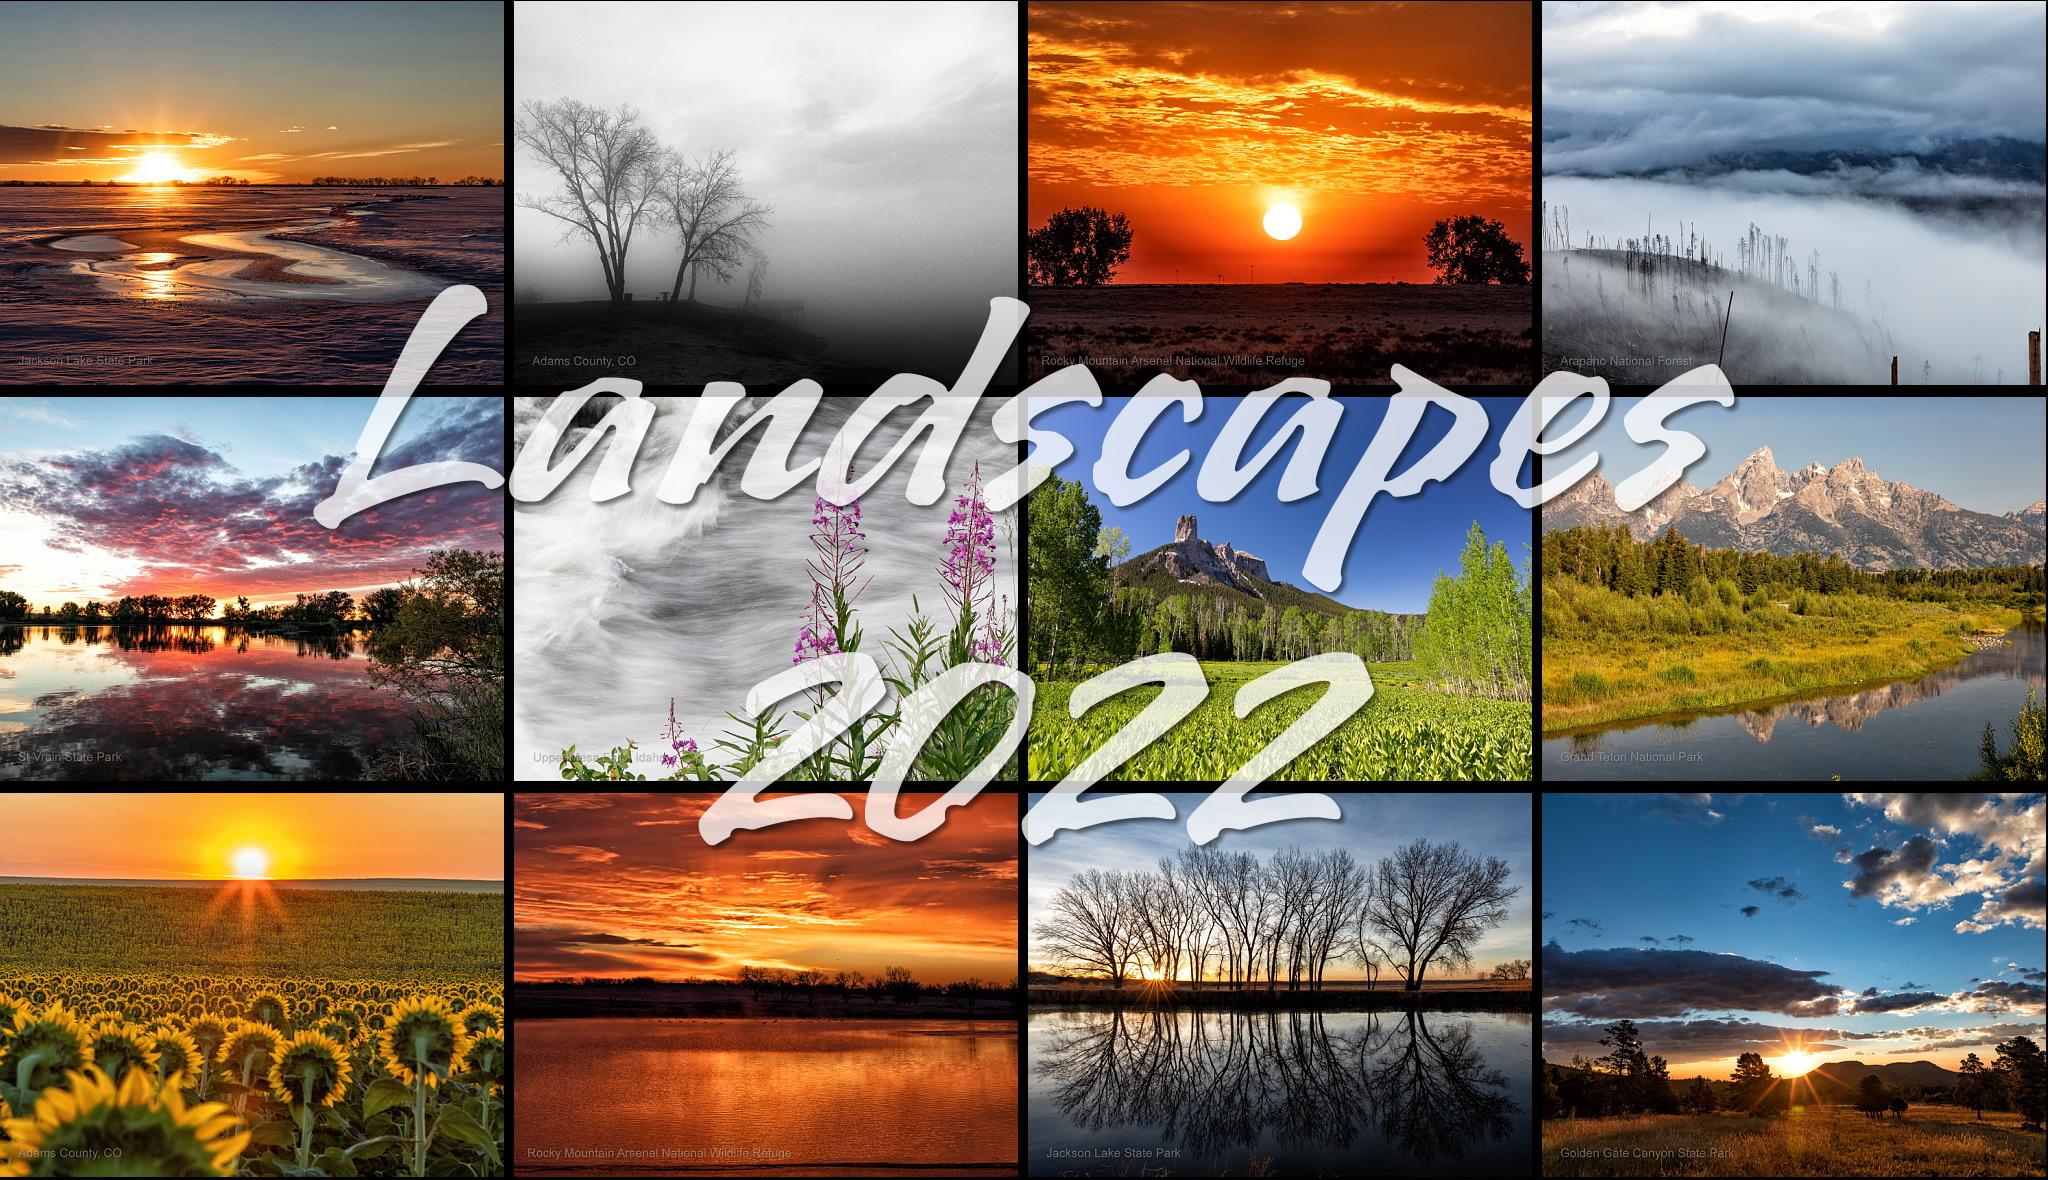 Landscapes 2022 calendar